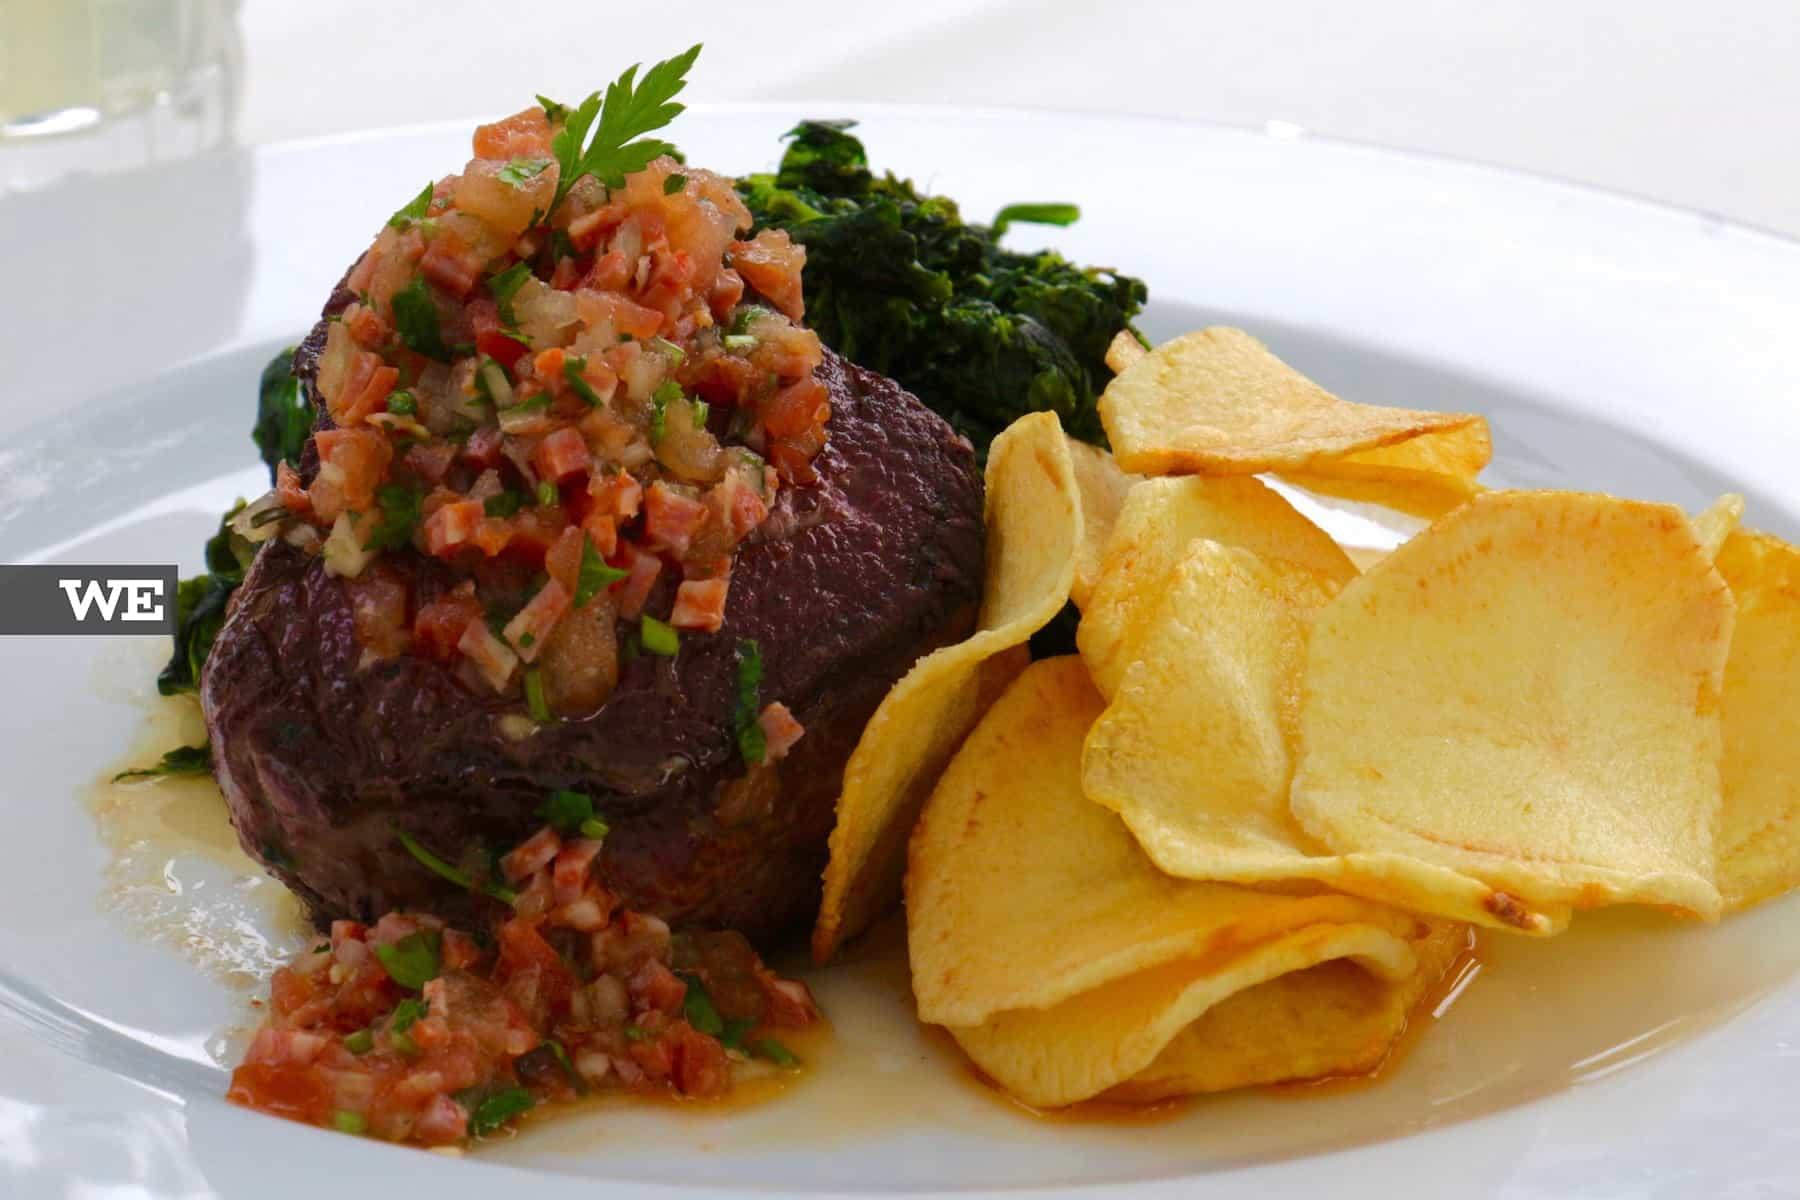 Comida mediterrânica no Alma D'eça - We Braga